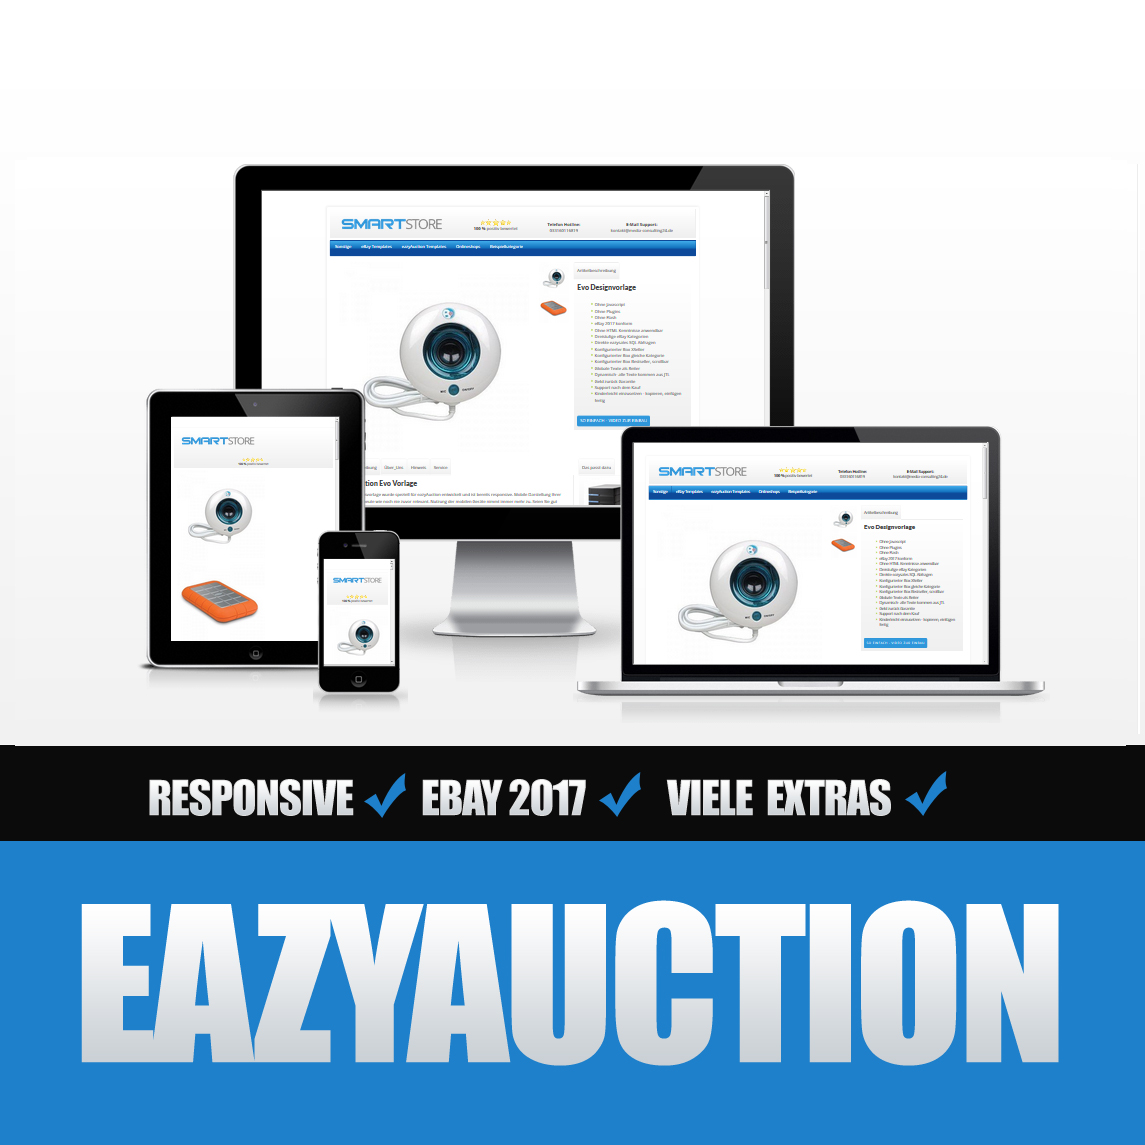 Eazyauction eBay Template 2017 #2-8